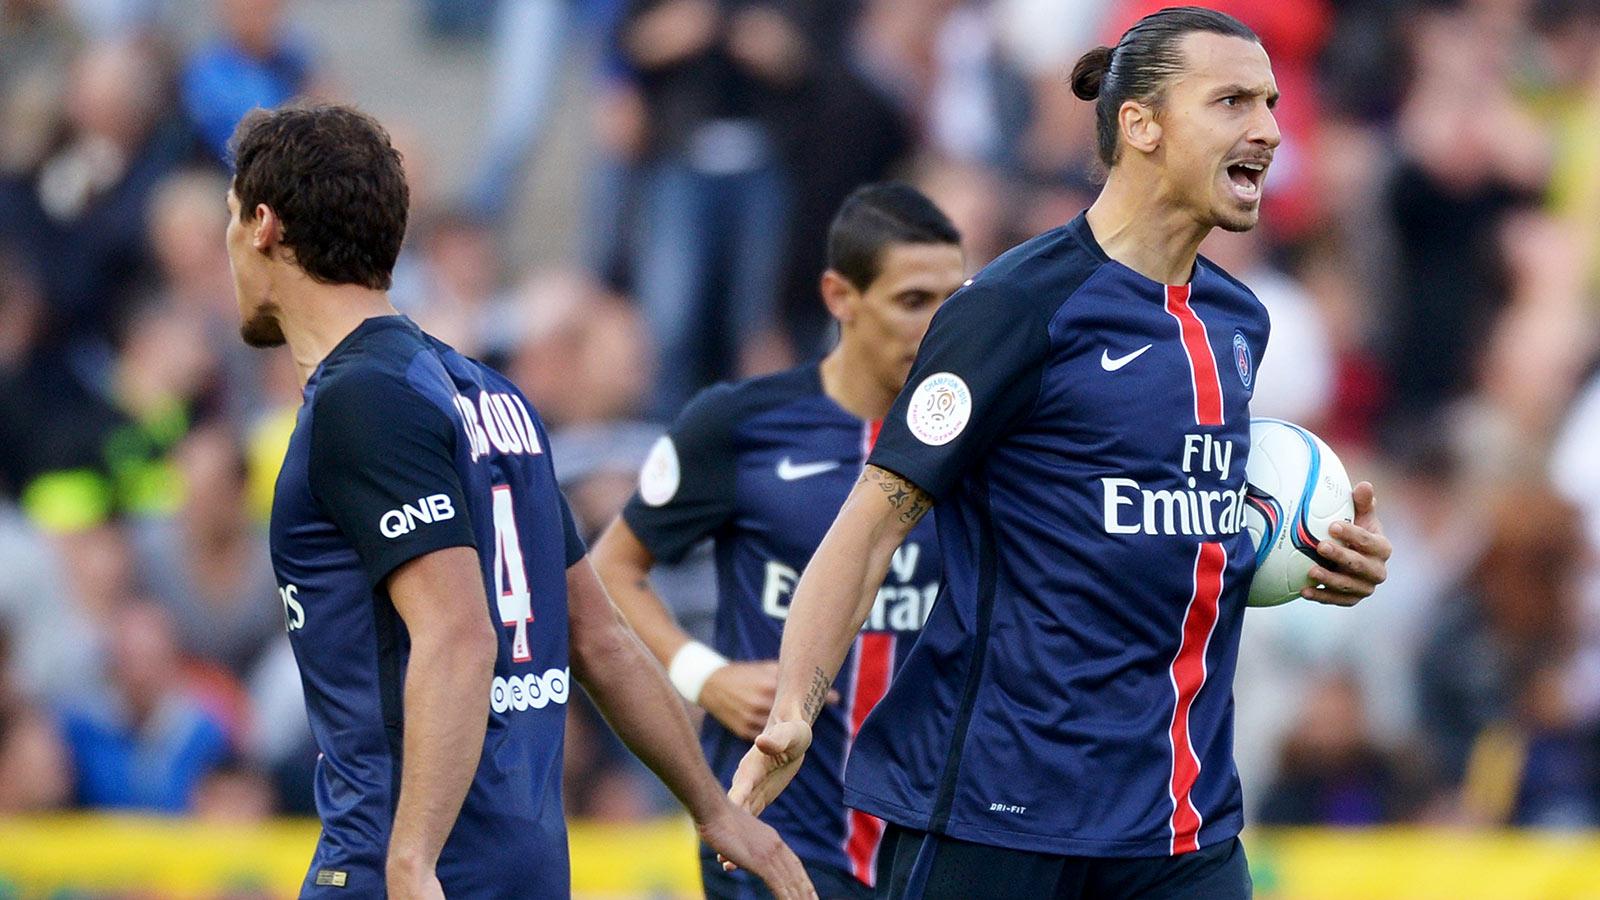 PSG remain unbeaten in Ligue 1, mount rally to thrash Nantes